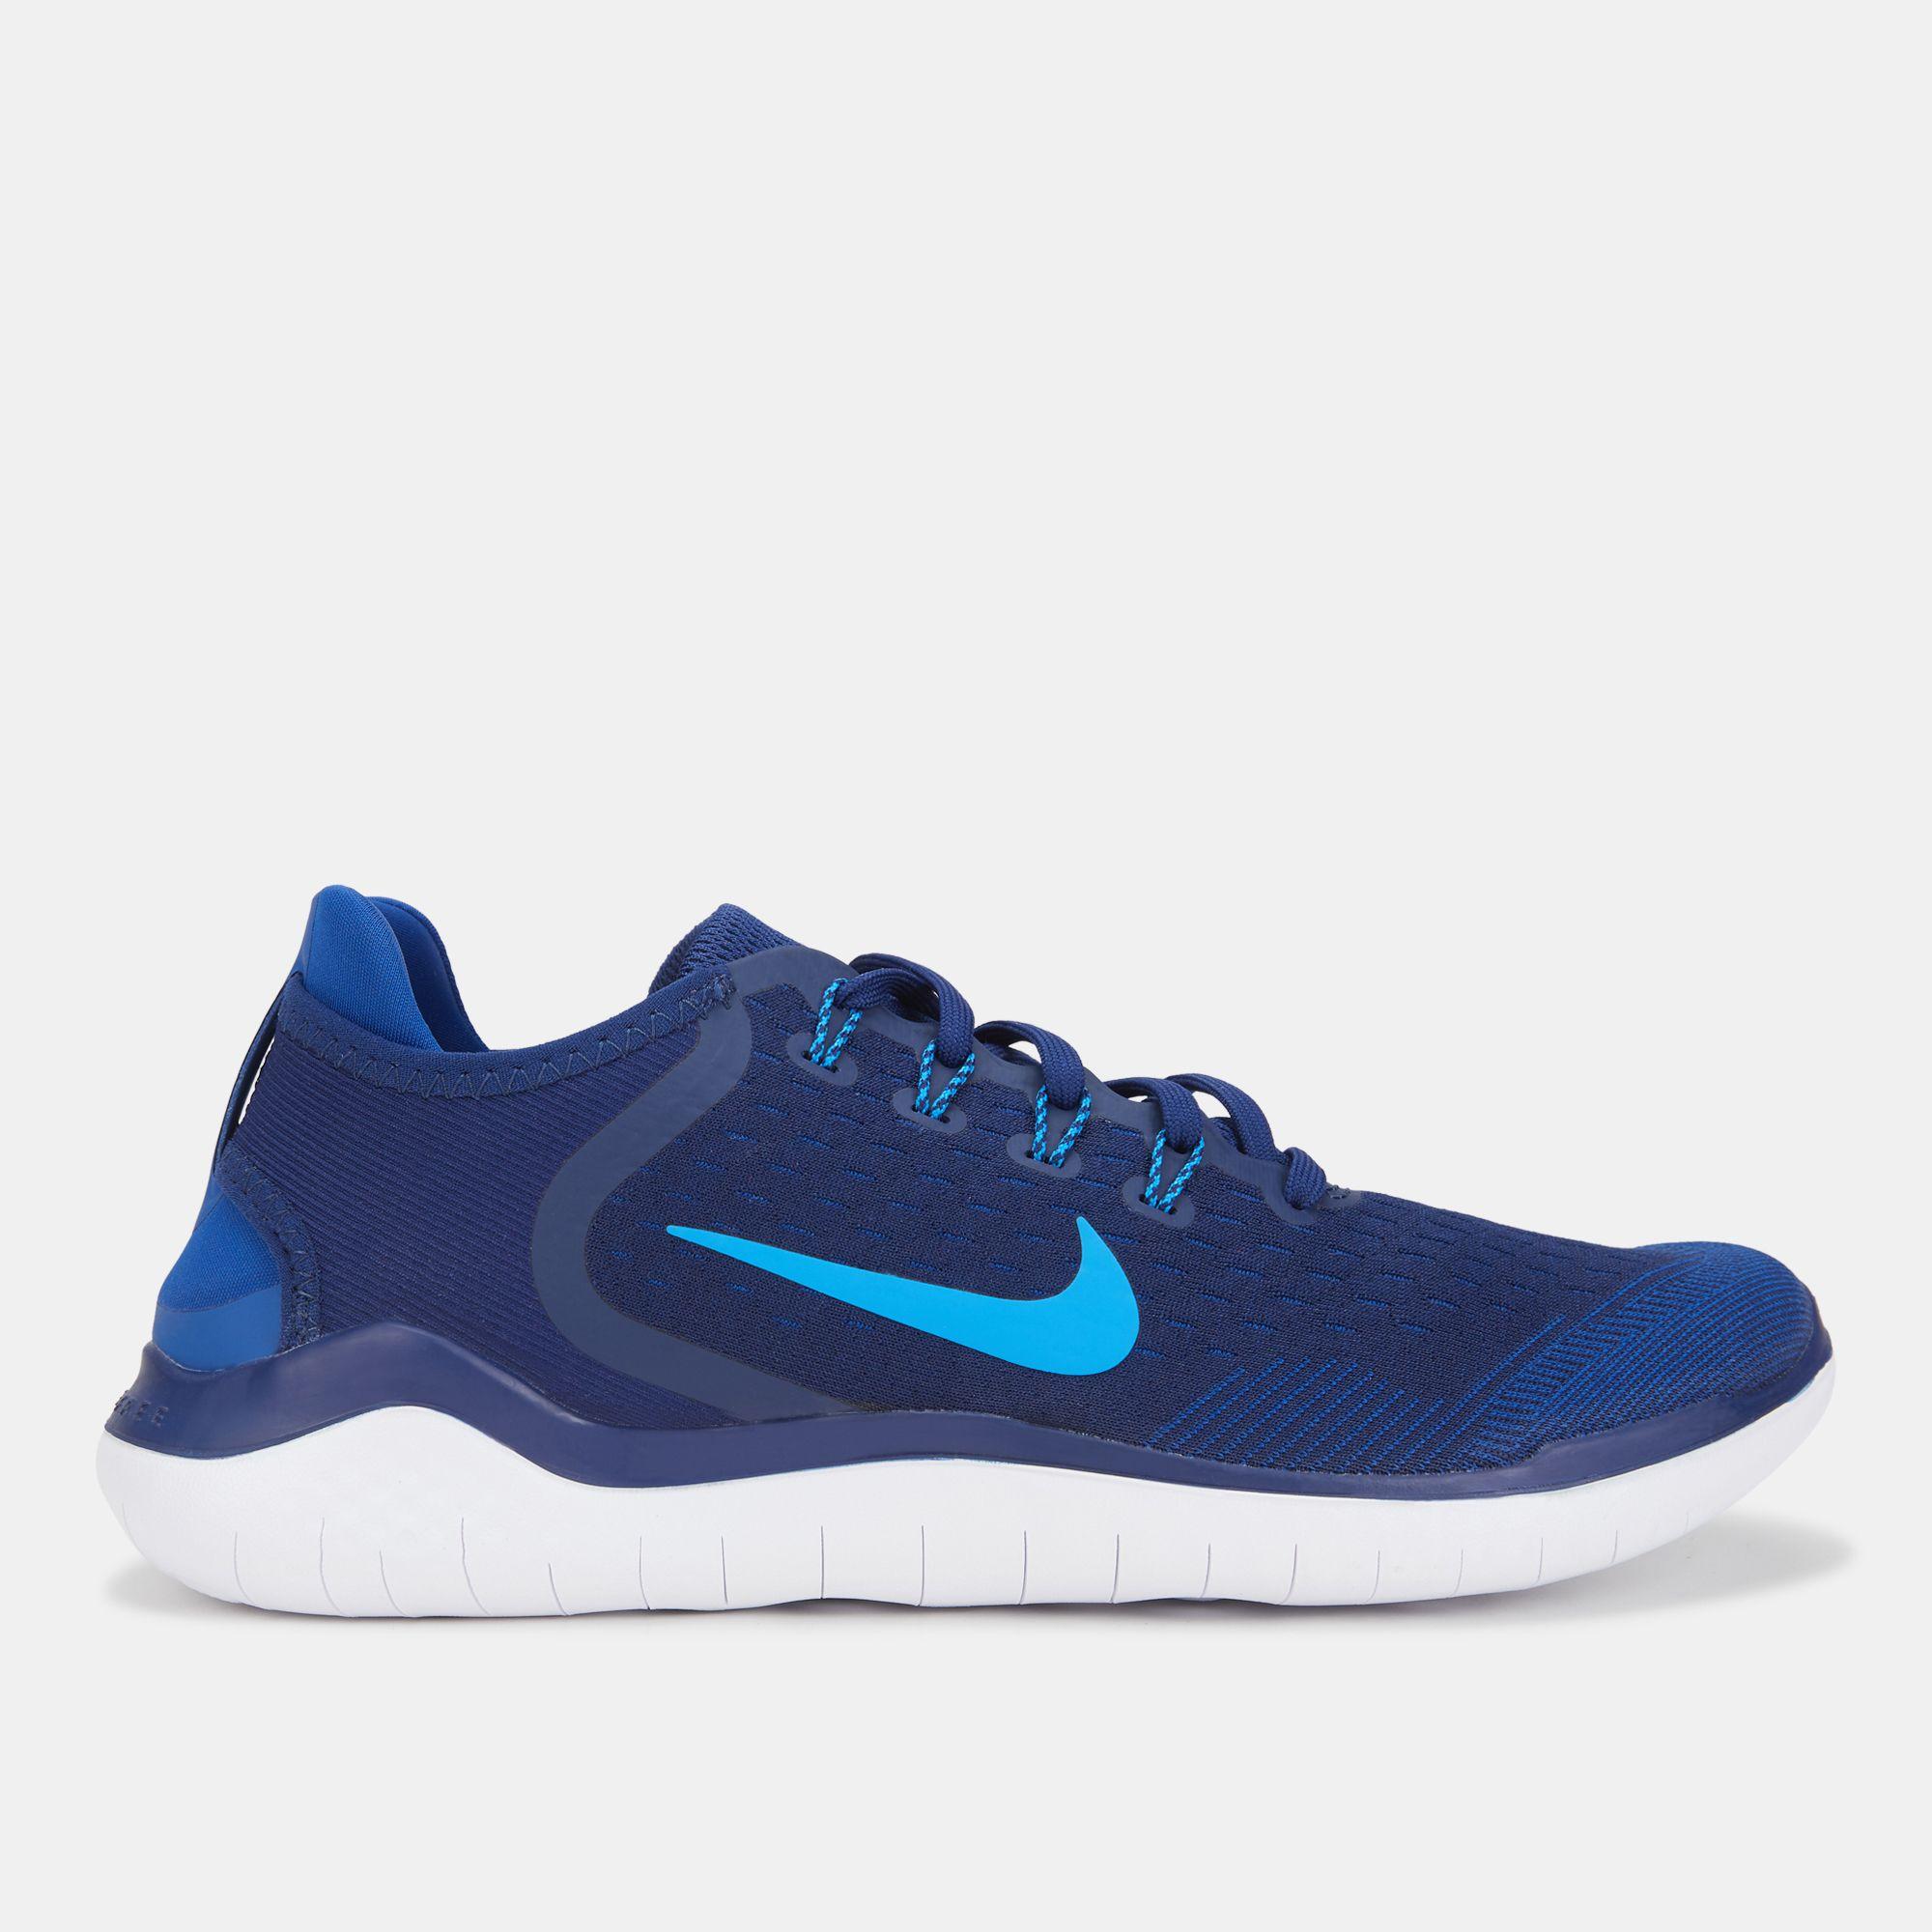 sports shoes 82e51 9f28d Nike Men's Free RN 2018 Shoe